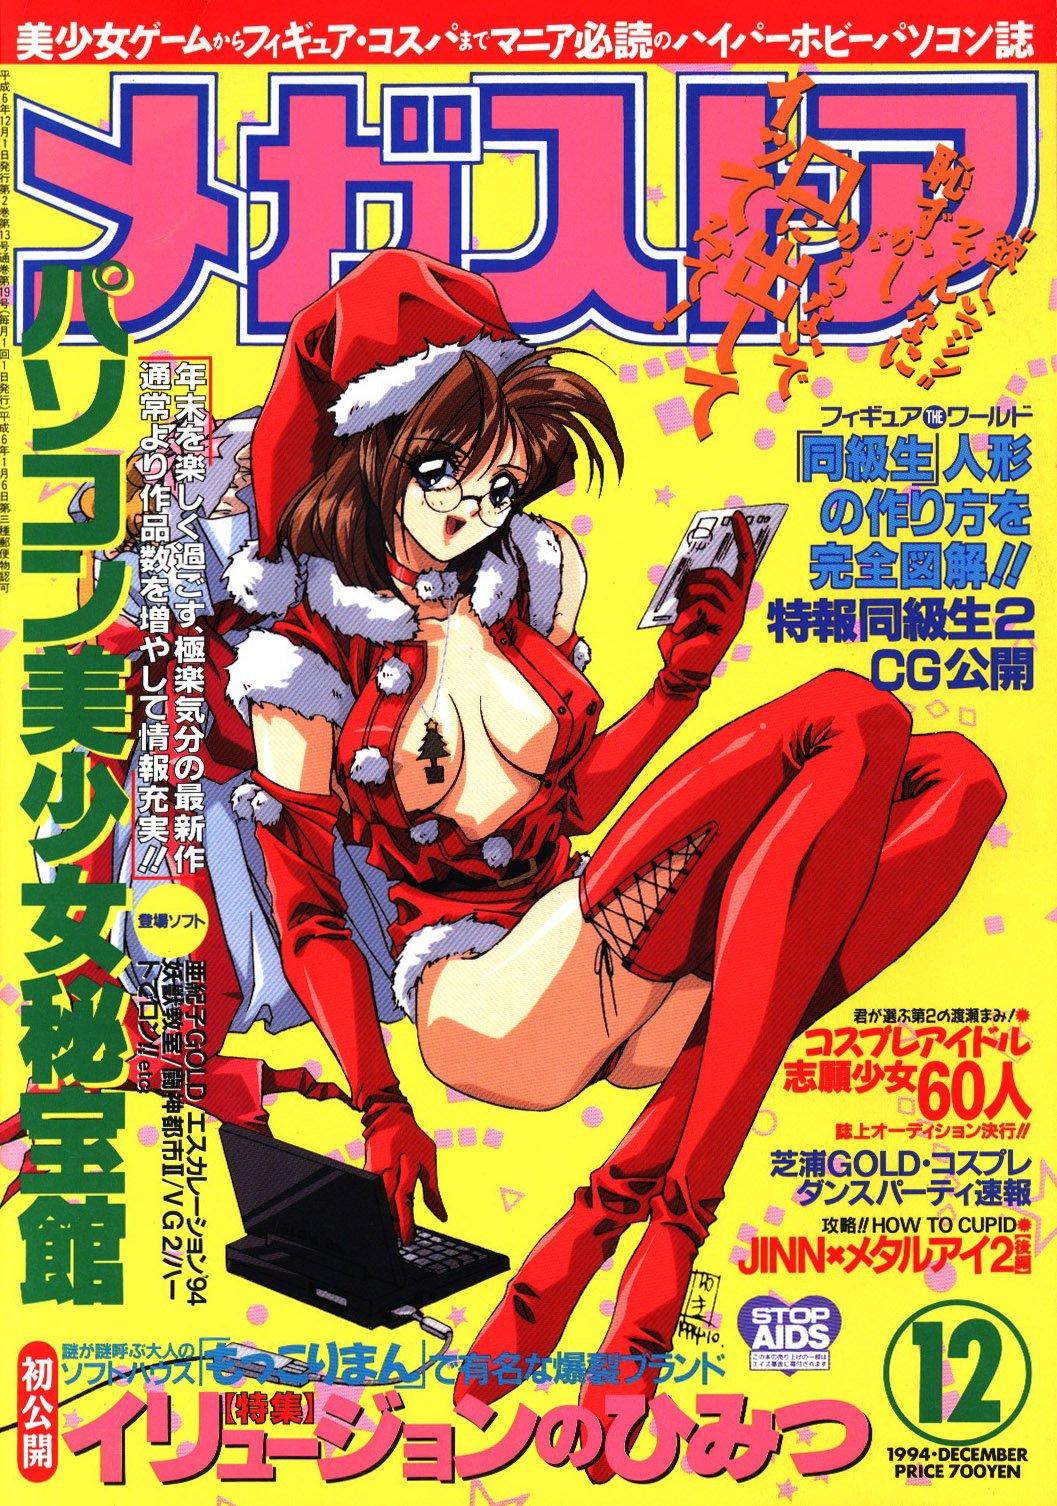 MegaStore 020 (December 1994)